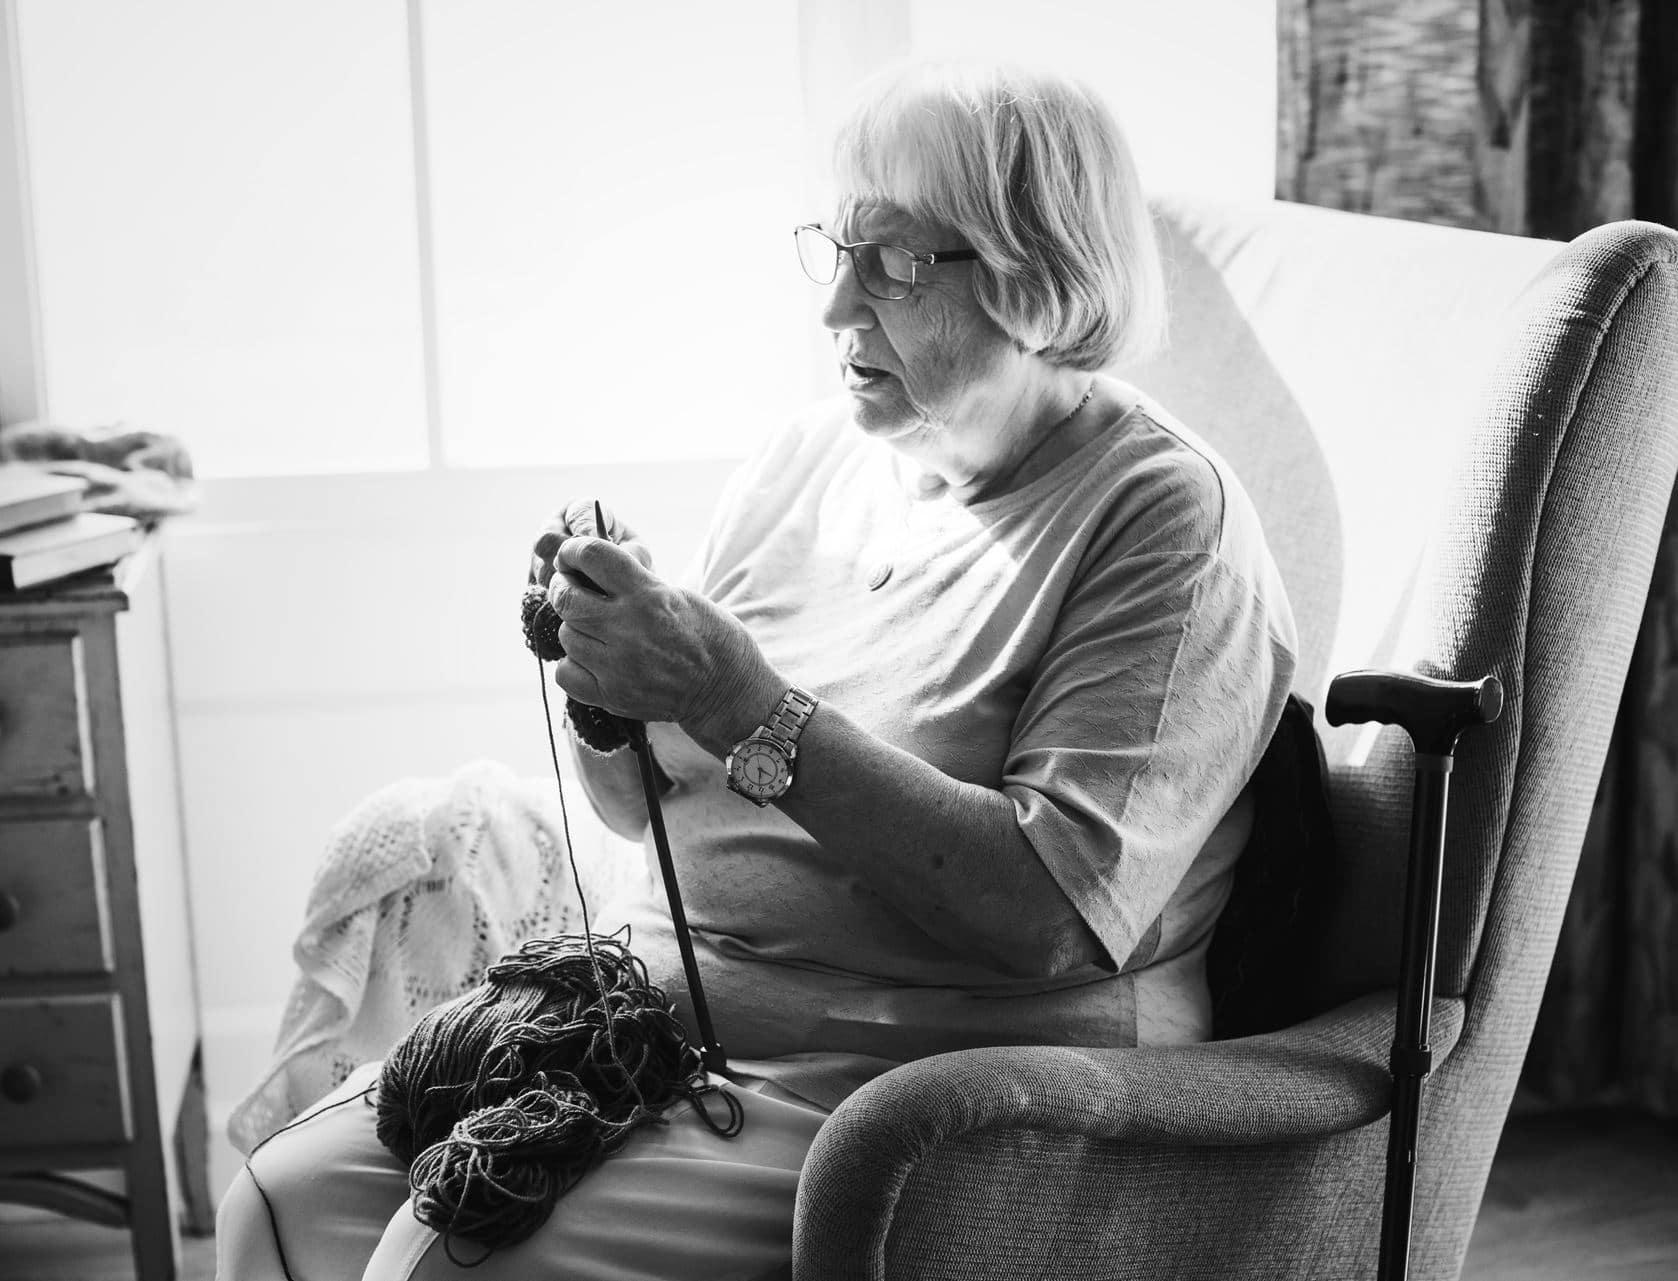 ריפוי בעיסוק באר שבע - Restart Therapy ריפוי בעיסוק למבוגרים